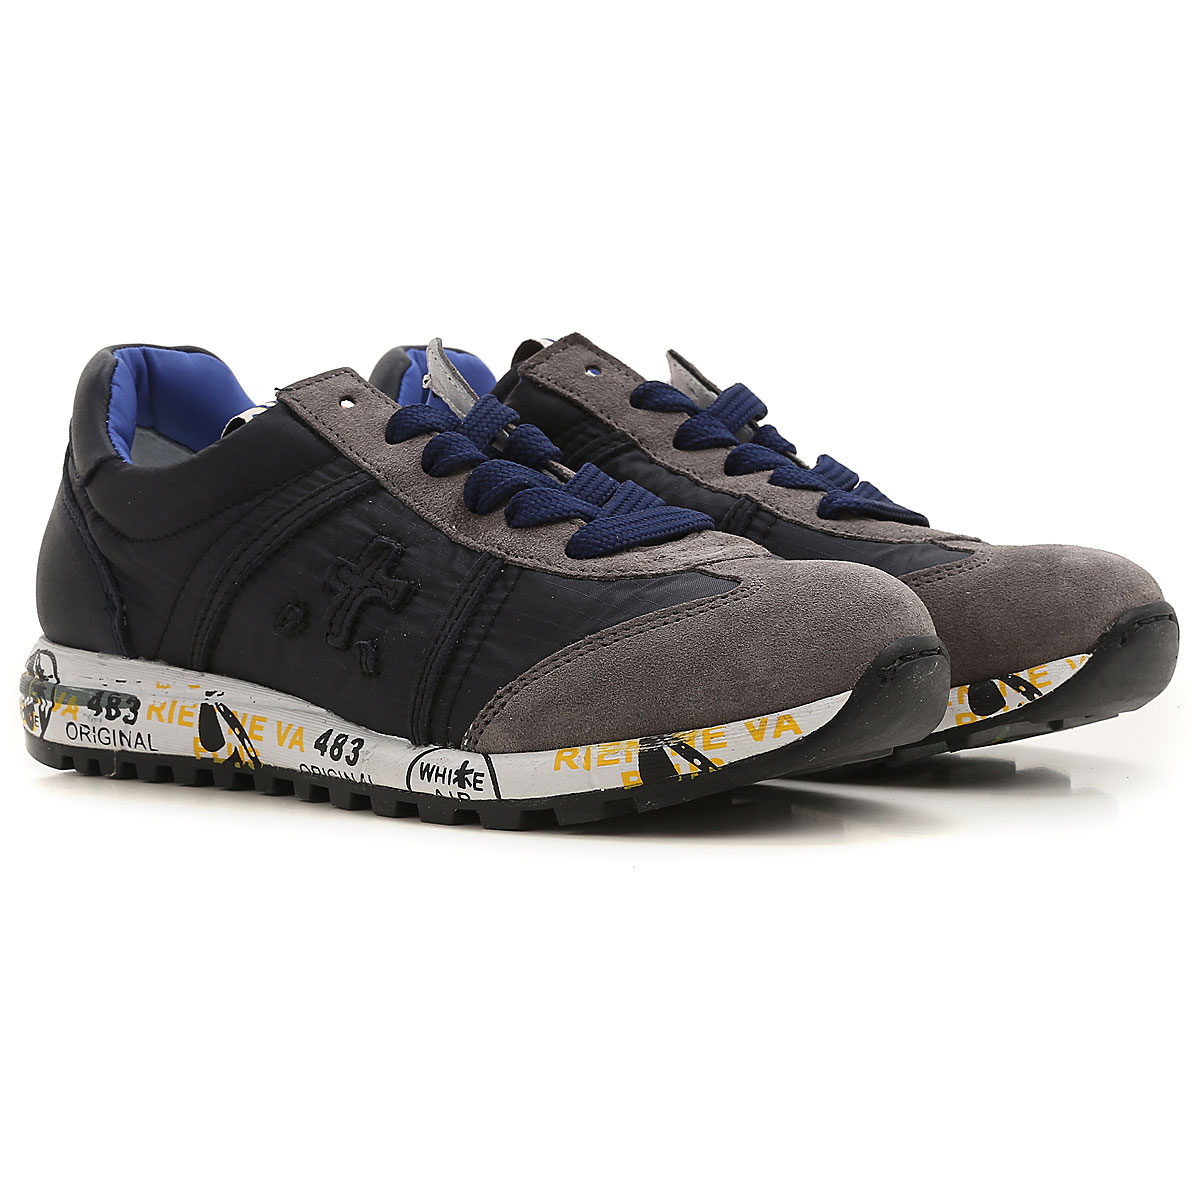 Premiata Kids Shoes for Boys On Sale, Blue, Nylon, 2019, 29 30 32 34